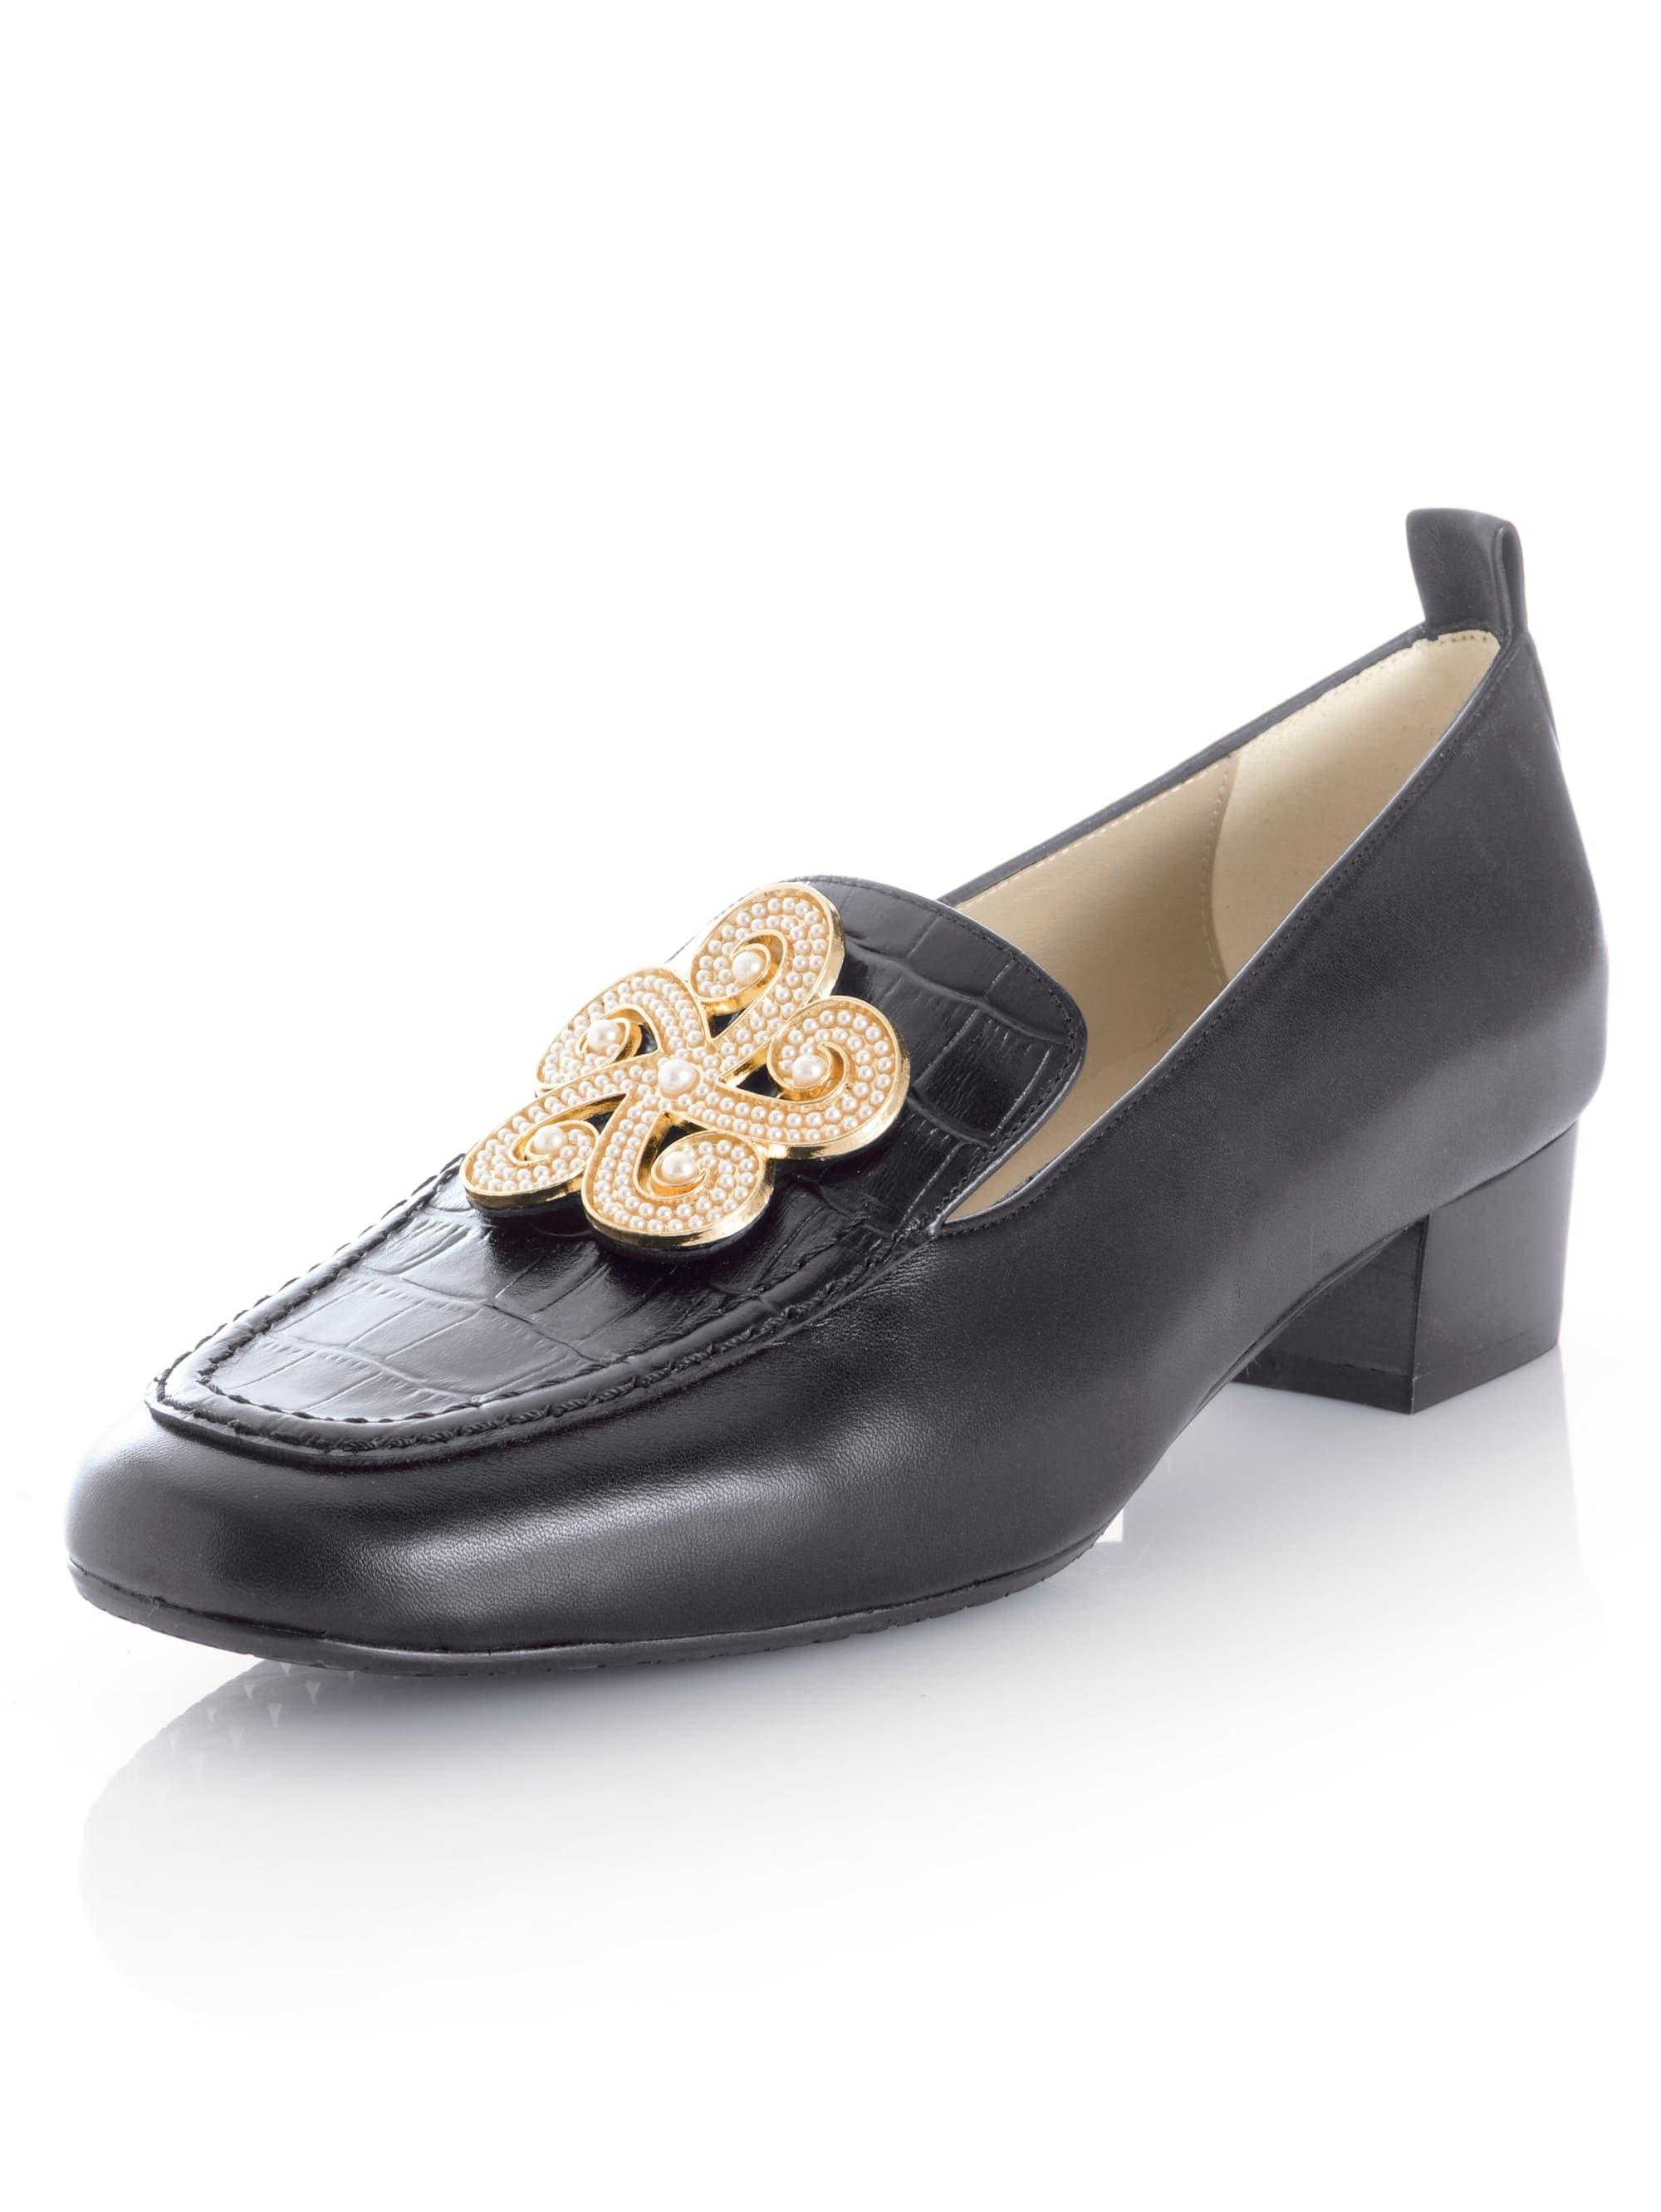 alba moda -  Loafer, aus hochwertigem Lammleder